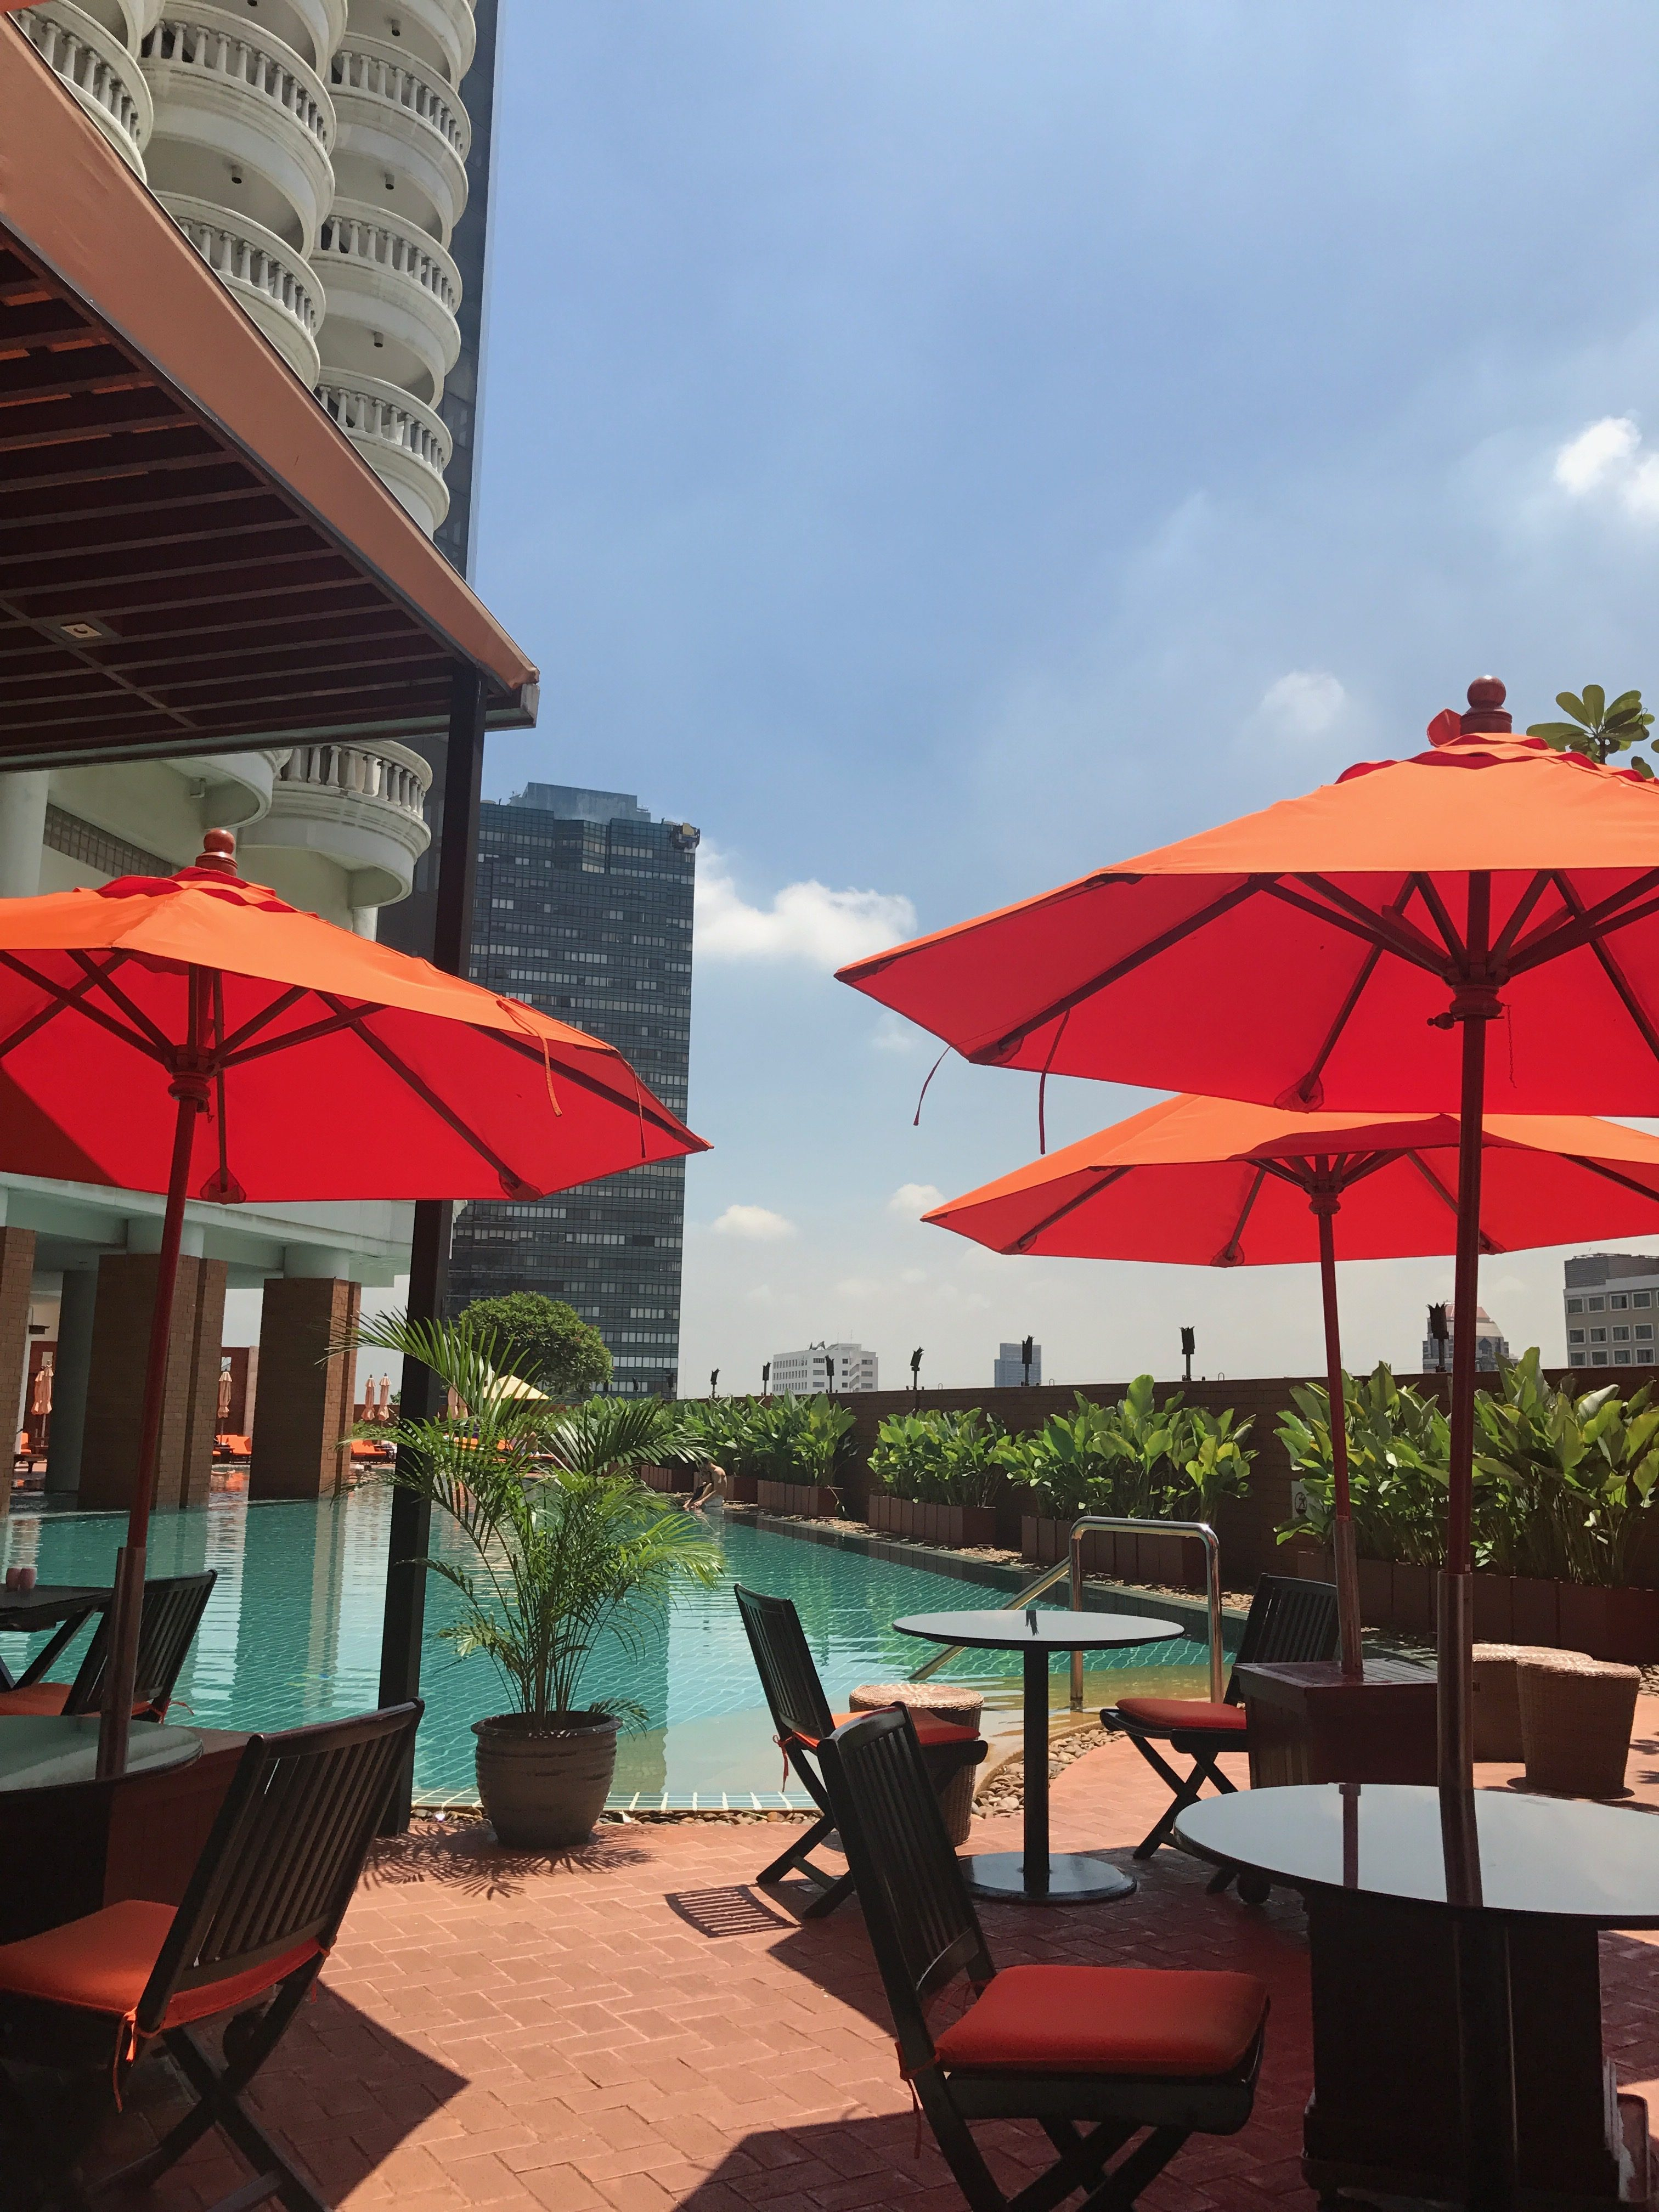 Bangkok-Tipps für Skeptiker | Lebua State BKK | www.dearlicious.com | Dear Nitjakan Bunbuamas